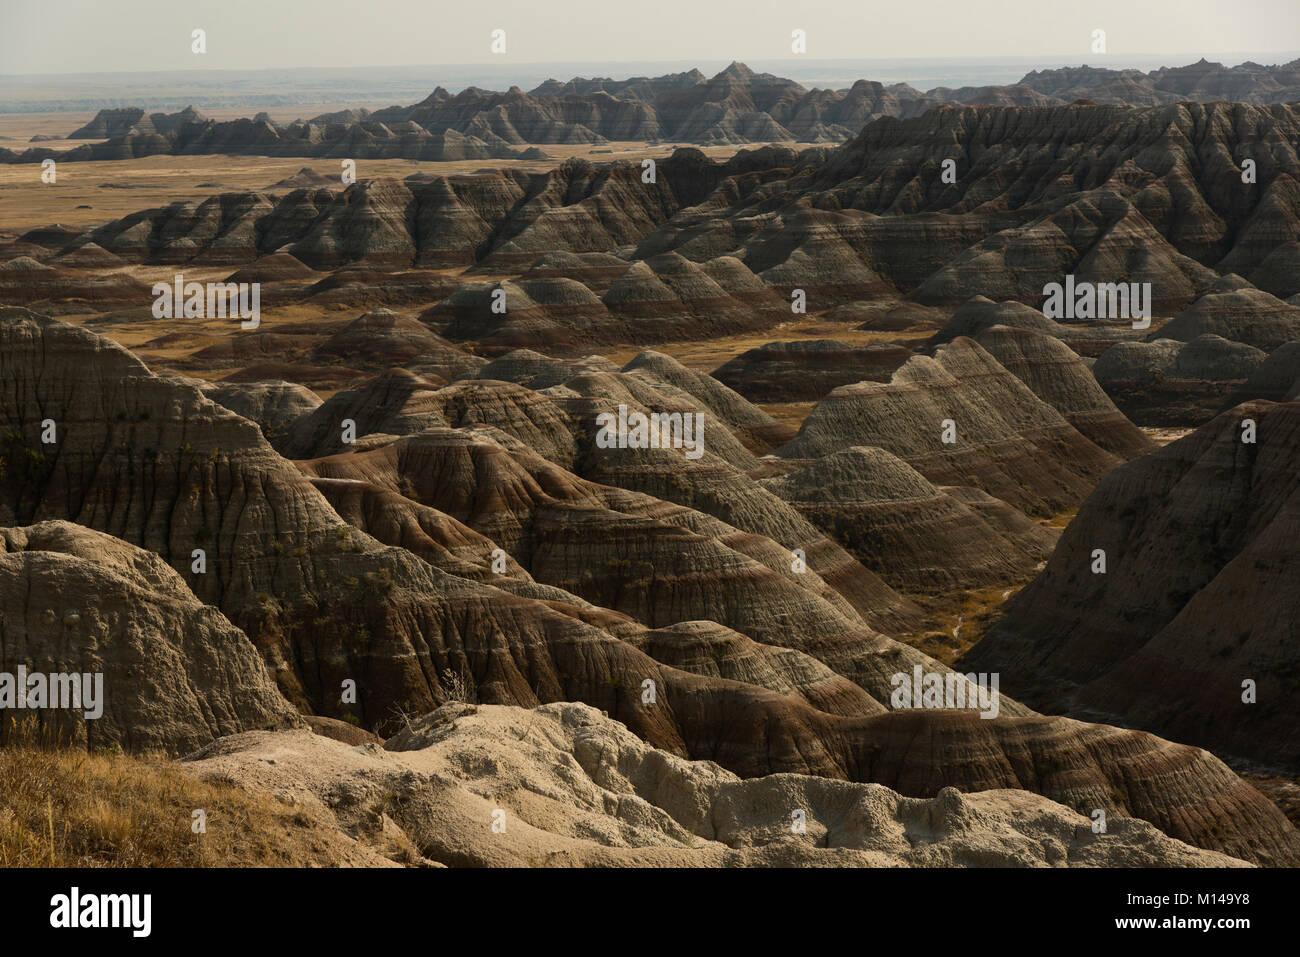 Nachmittag, die conata Basin, die Badlands, South Dakota, USA. Stockbild